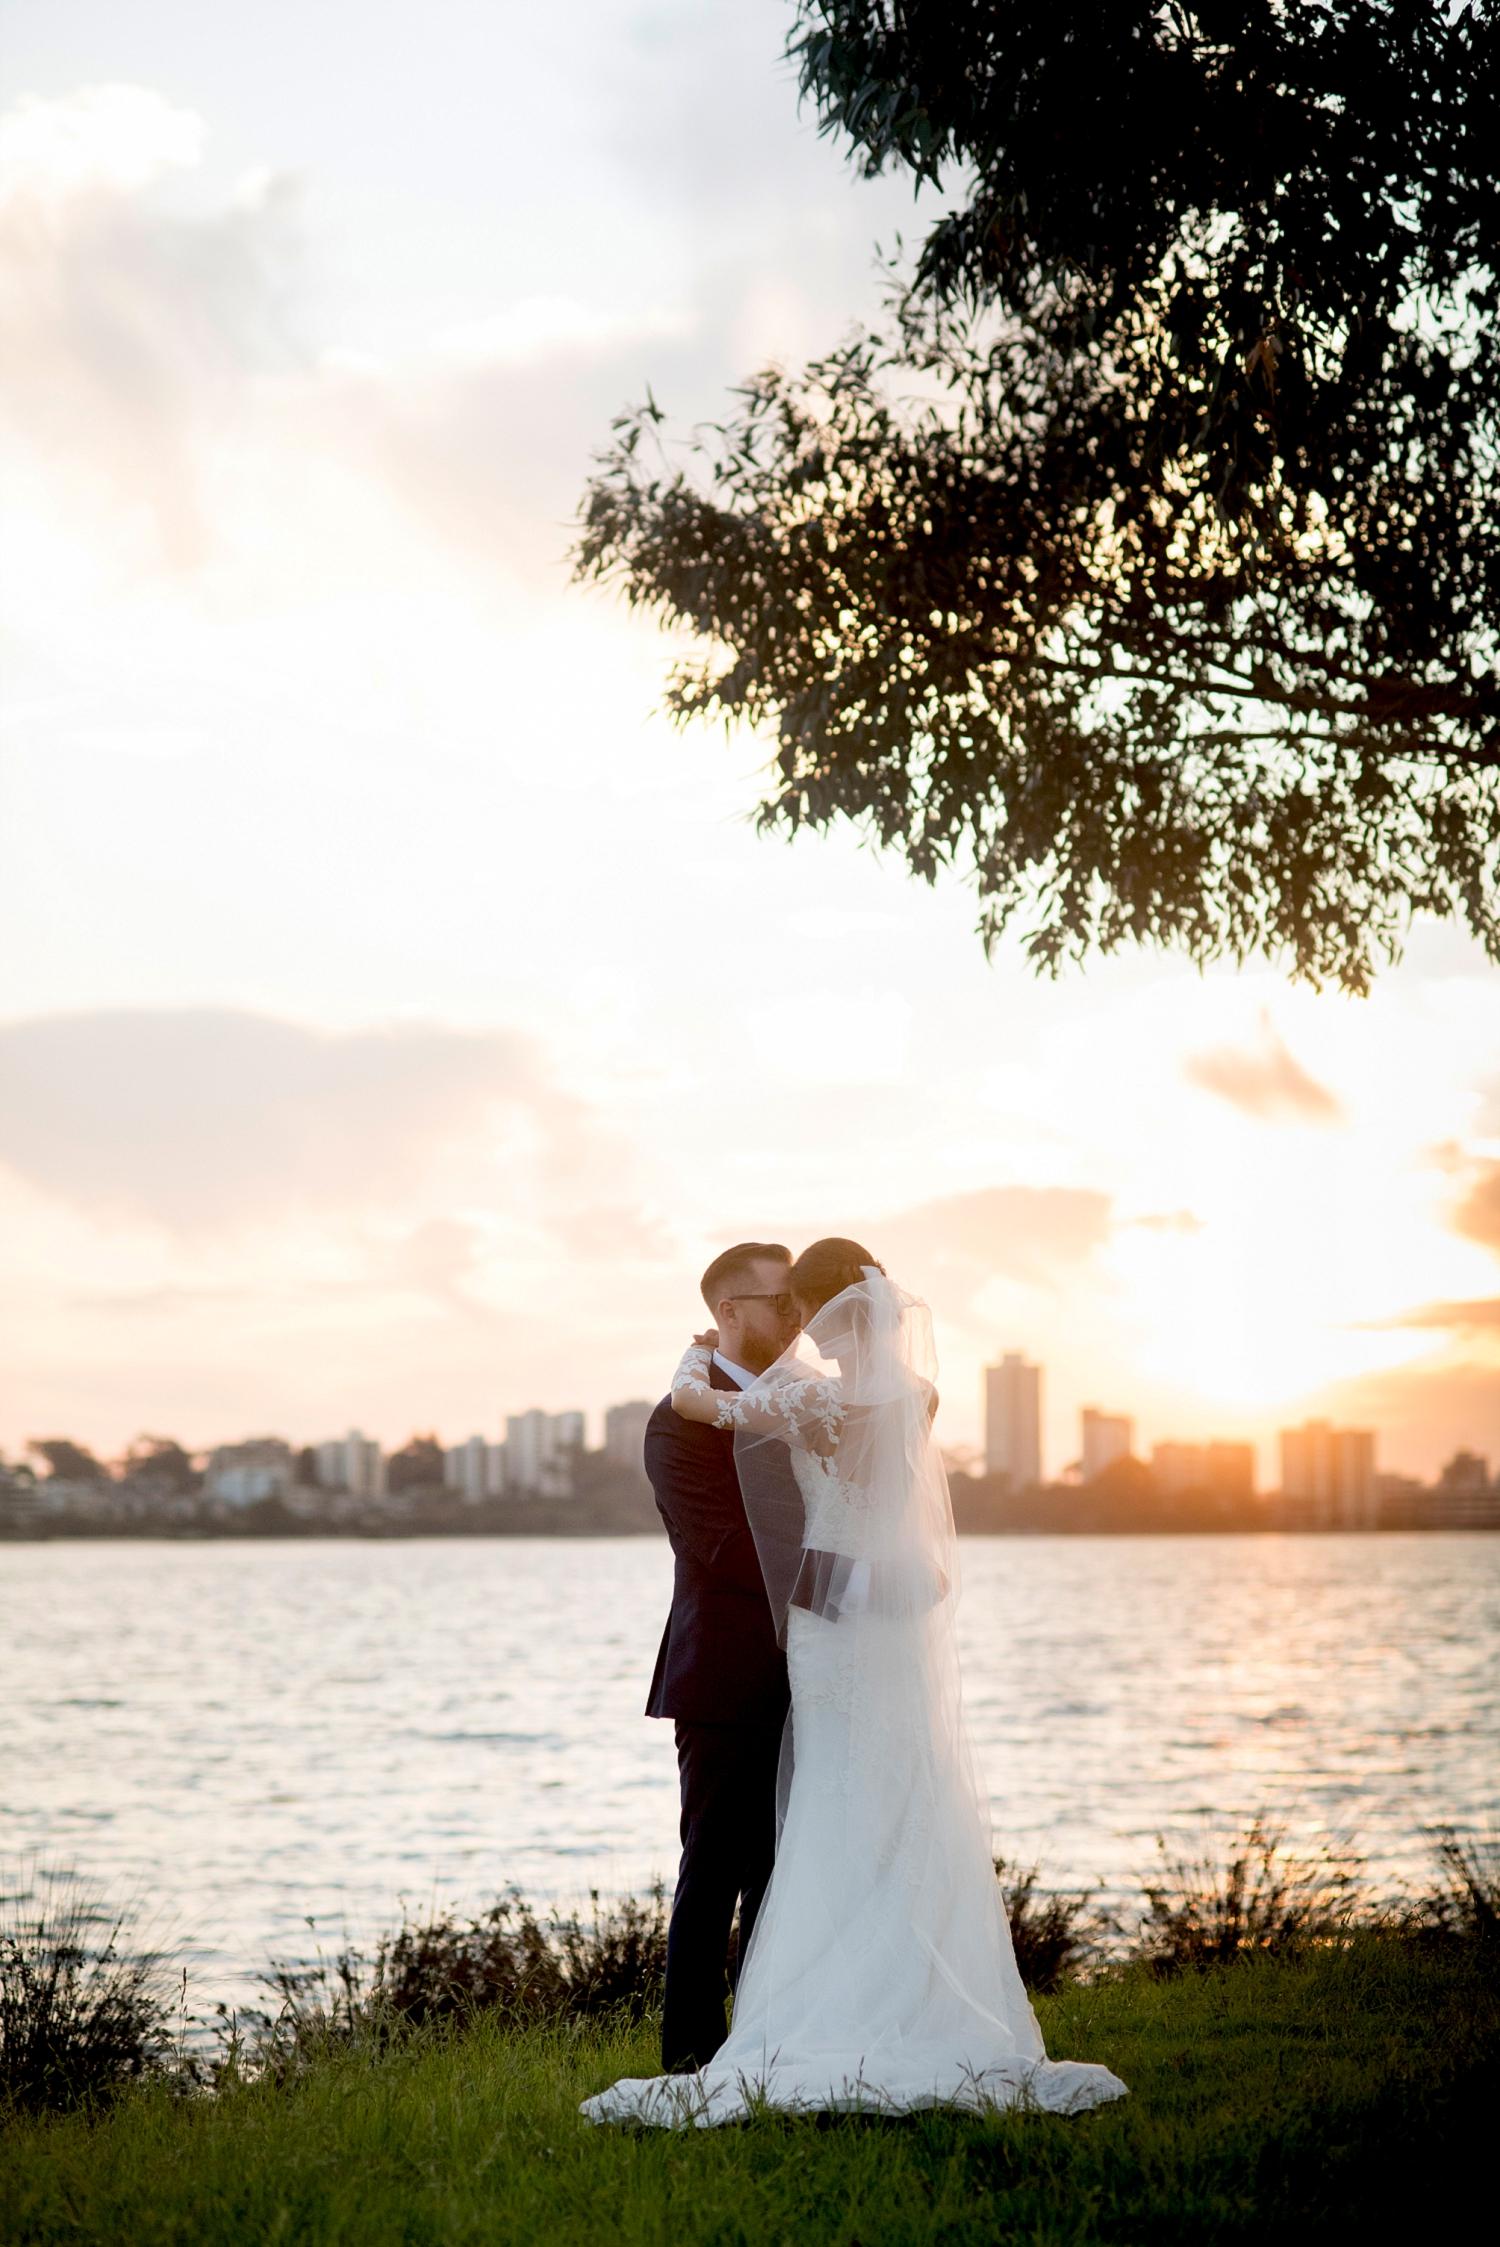 164_perth wedding photographer deray simcoe .jpg